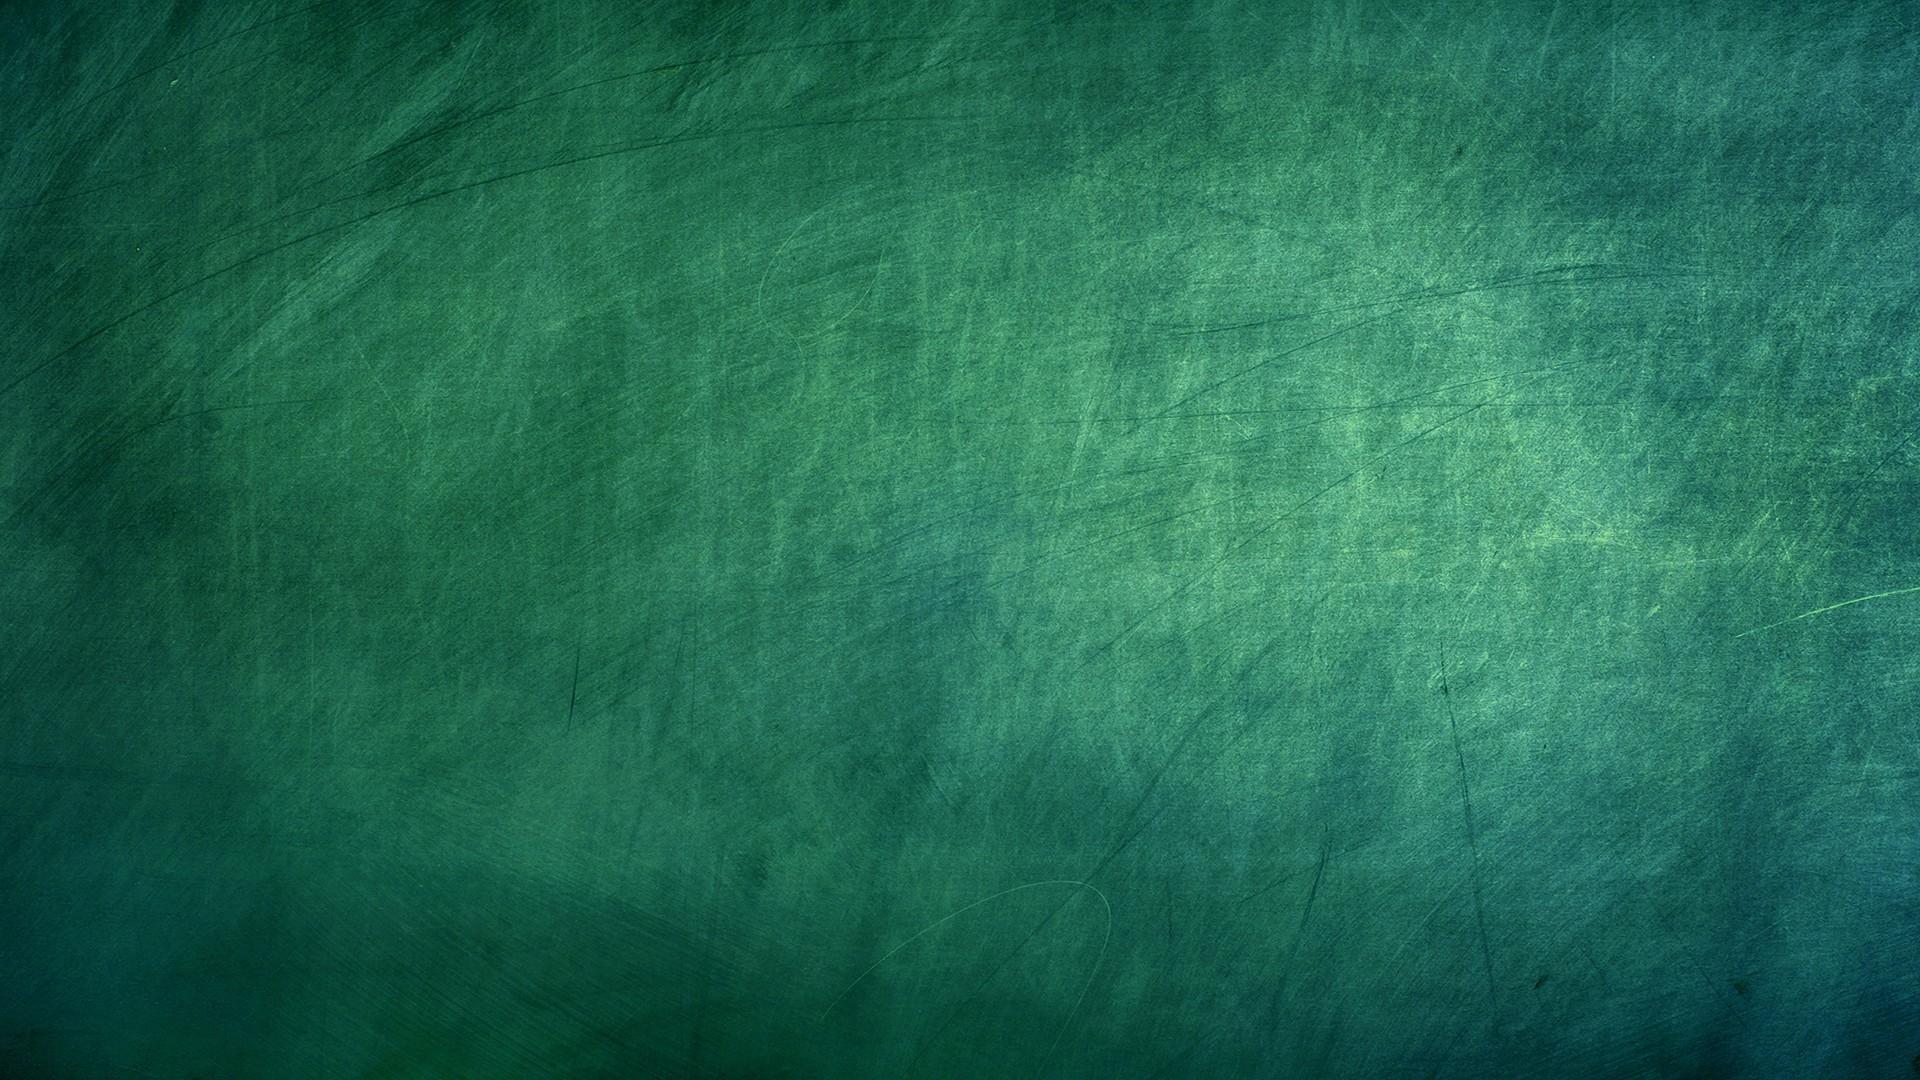 Stunning Black Wallpapers Chalkboard Wallpaper 183 ① Download Free Stunning Full Hd